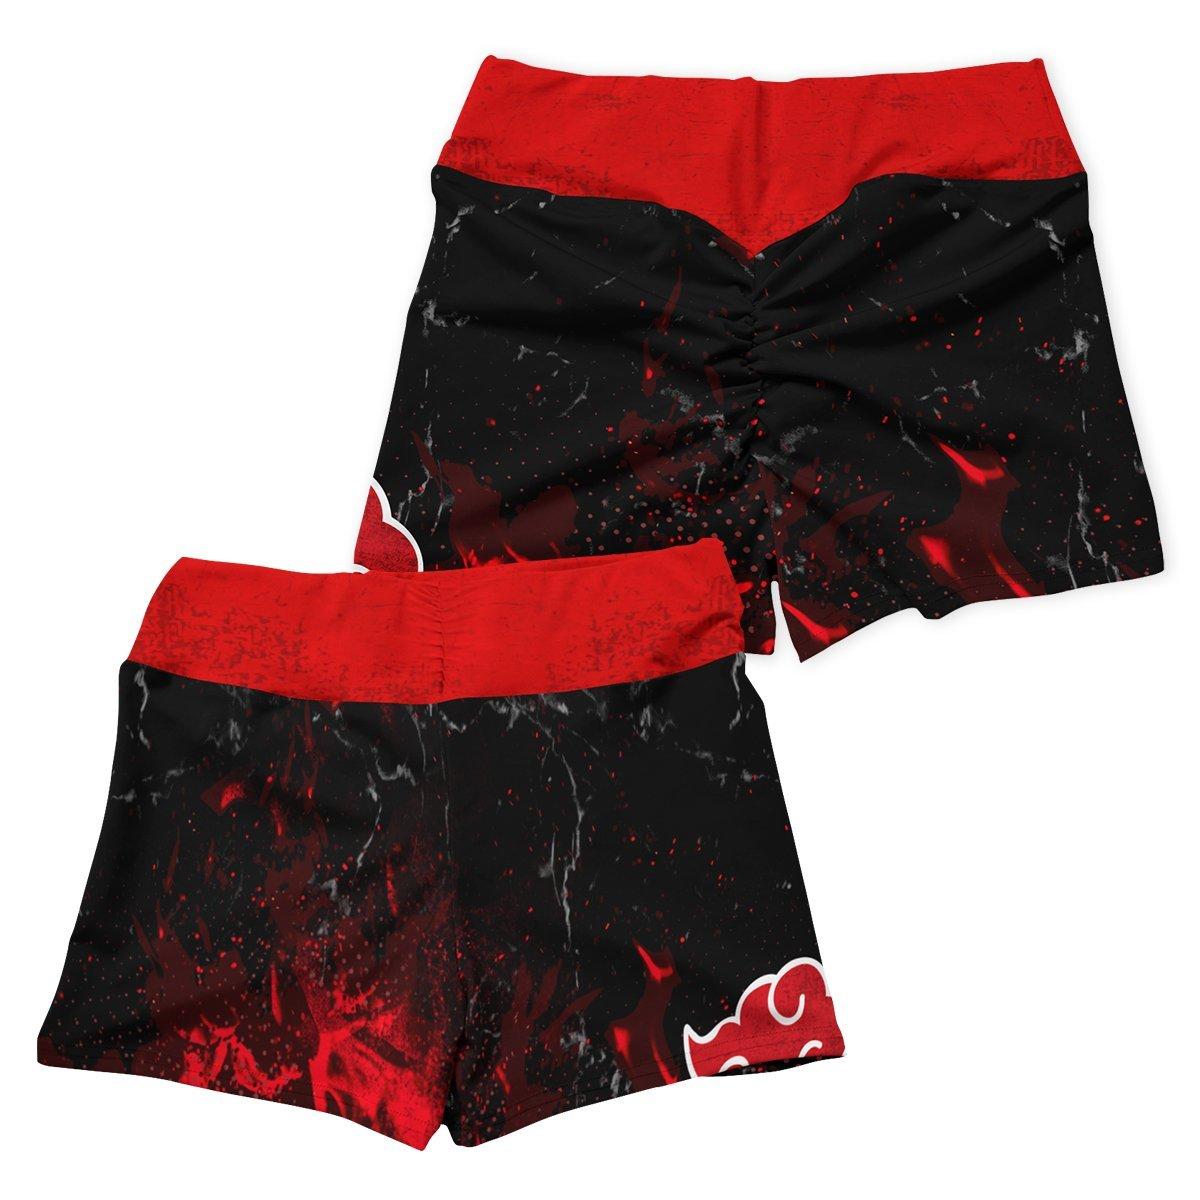 naruto akatsuki pride active wear set 160589 - Anime Swimsuits